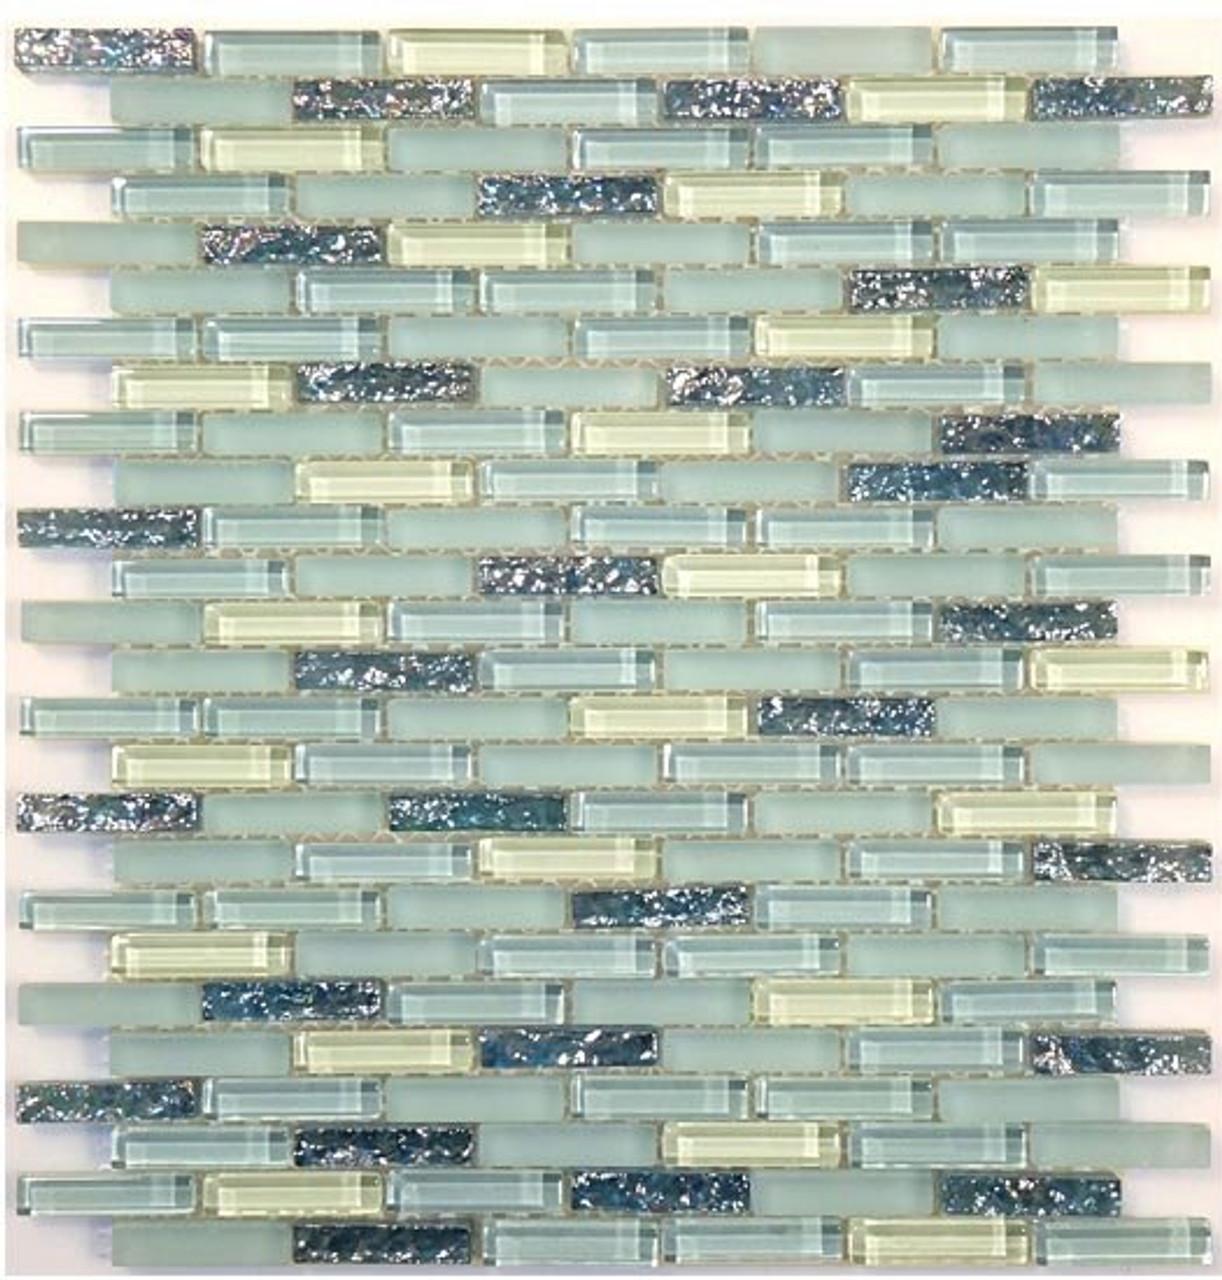 Bella Glass Tiles Bella Glass Tiles Jewel Series J-604 Aqua Marine